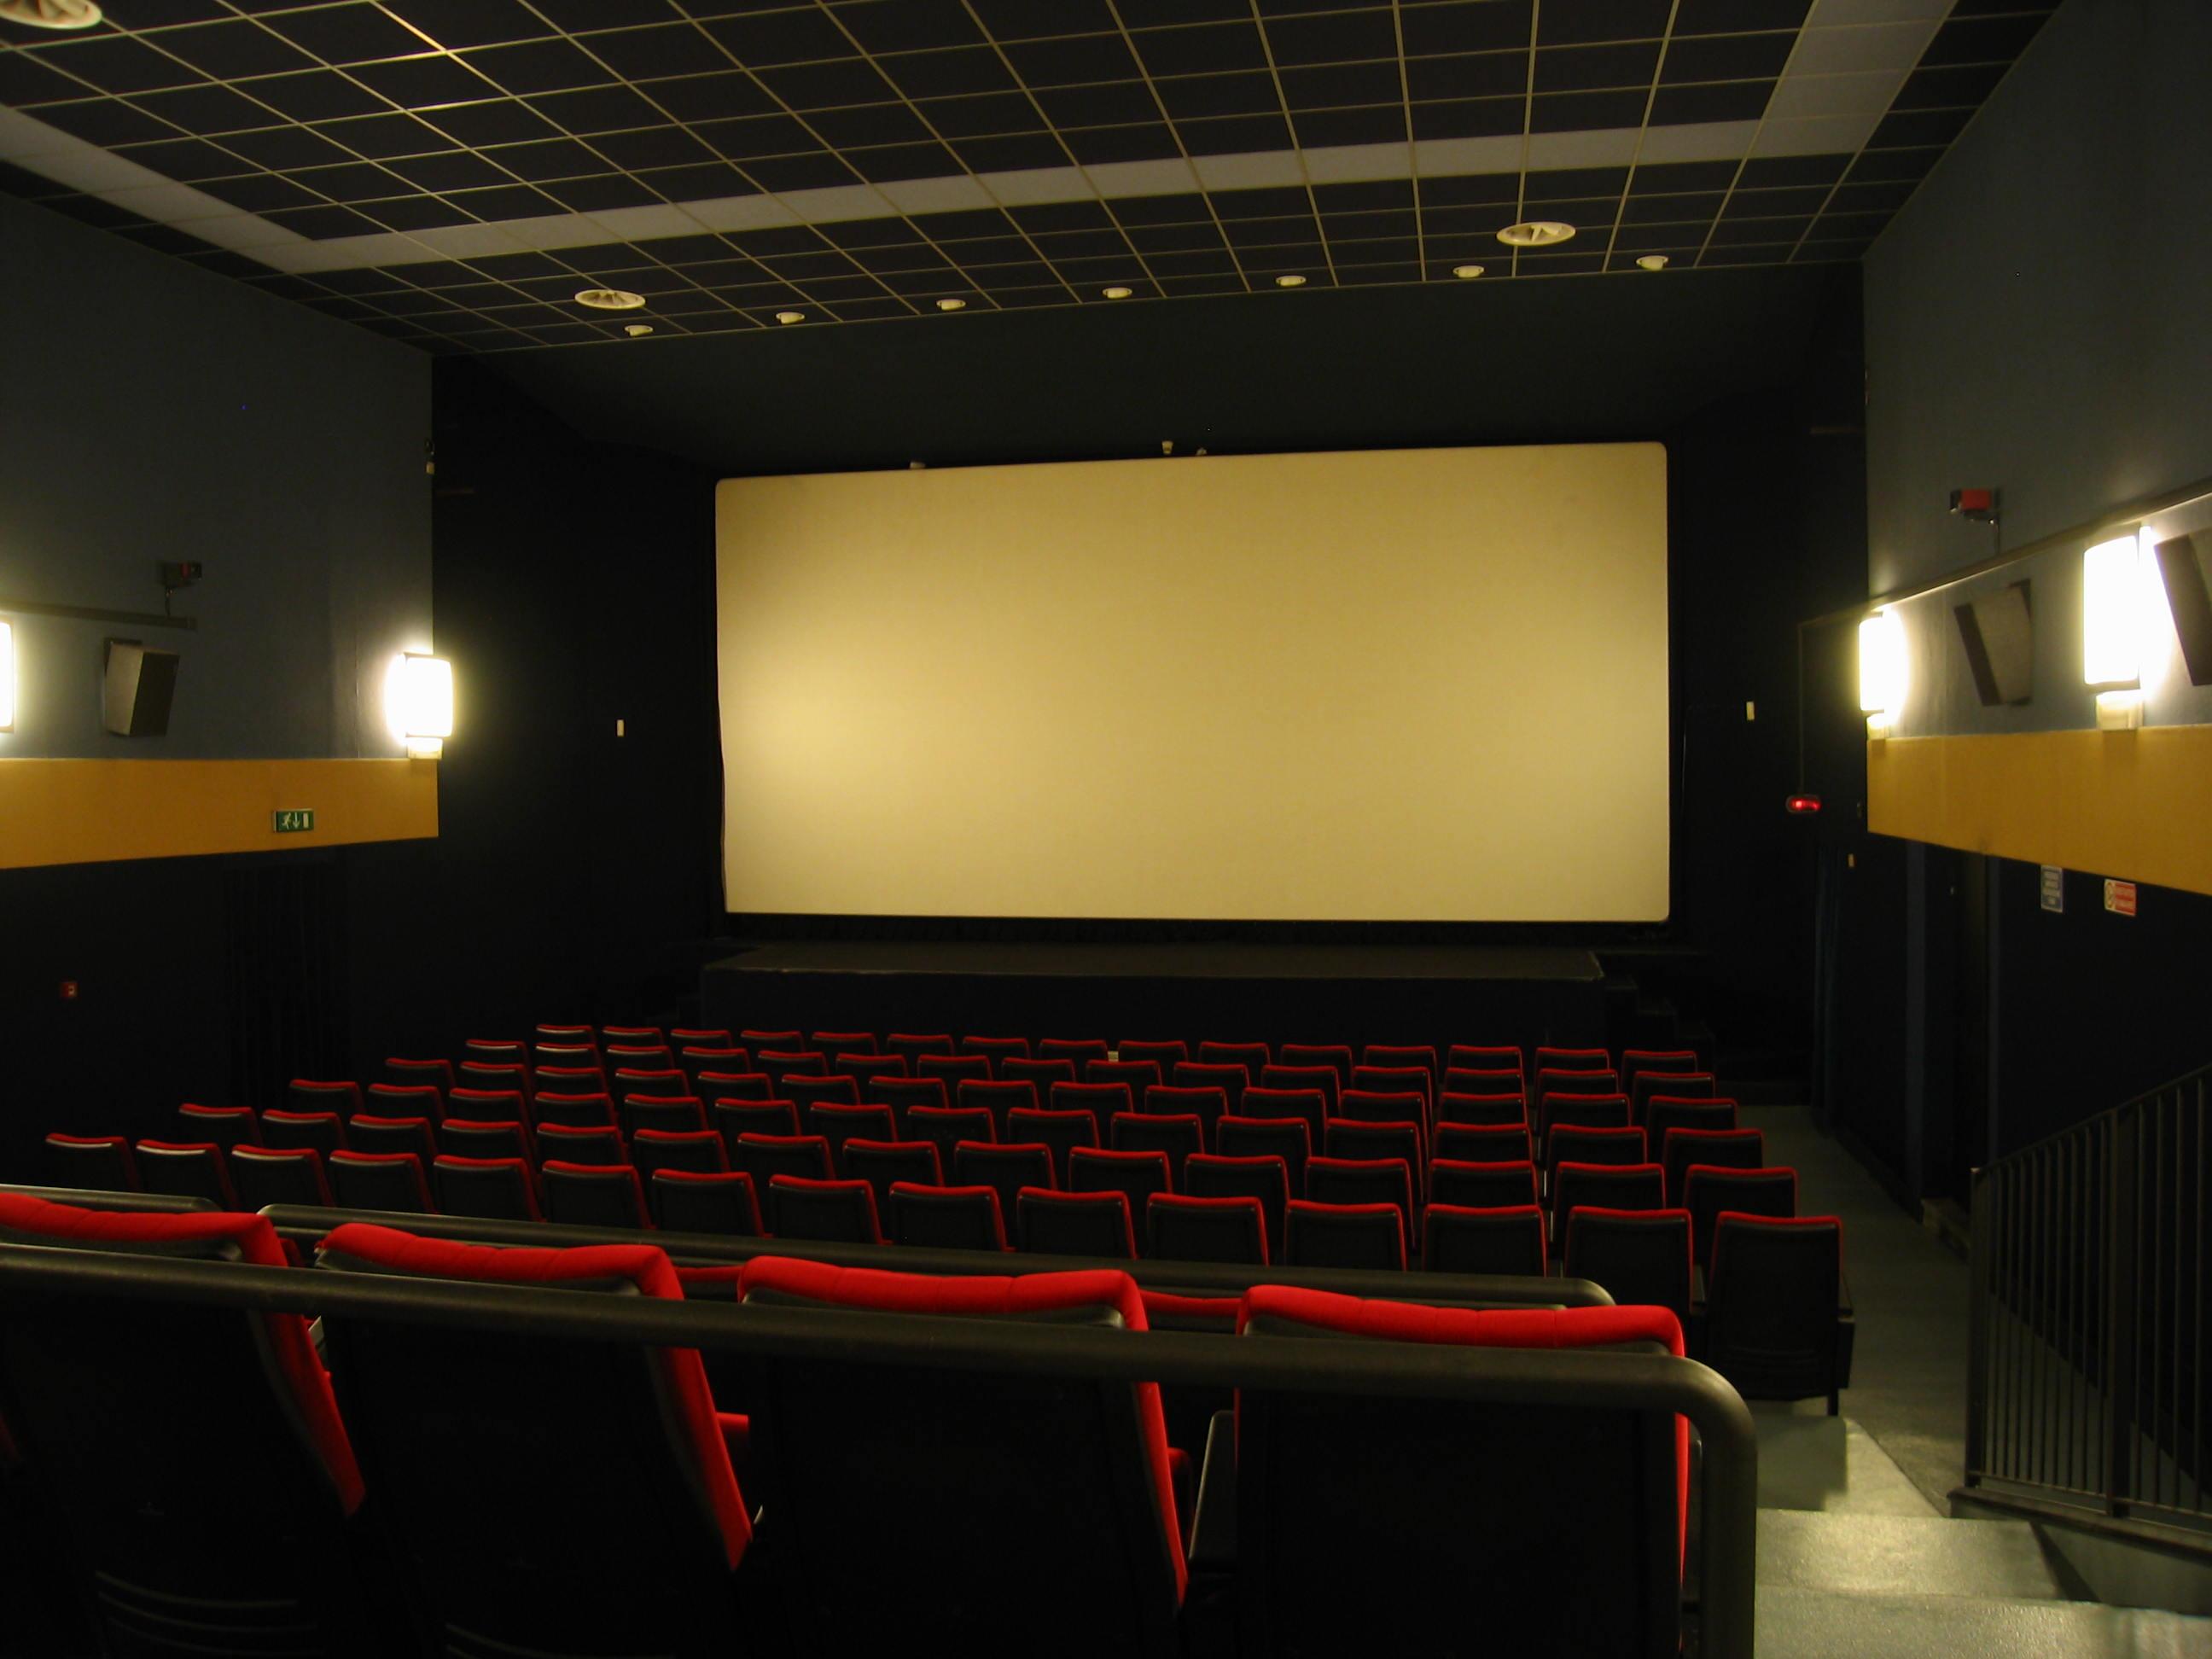 Nijmegen bioscoop  bioscopen bioscoopagenda en filmladder